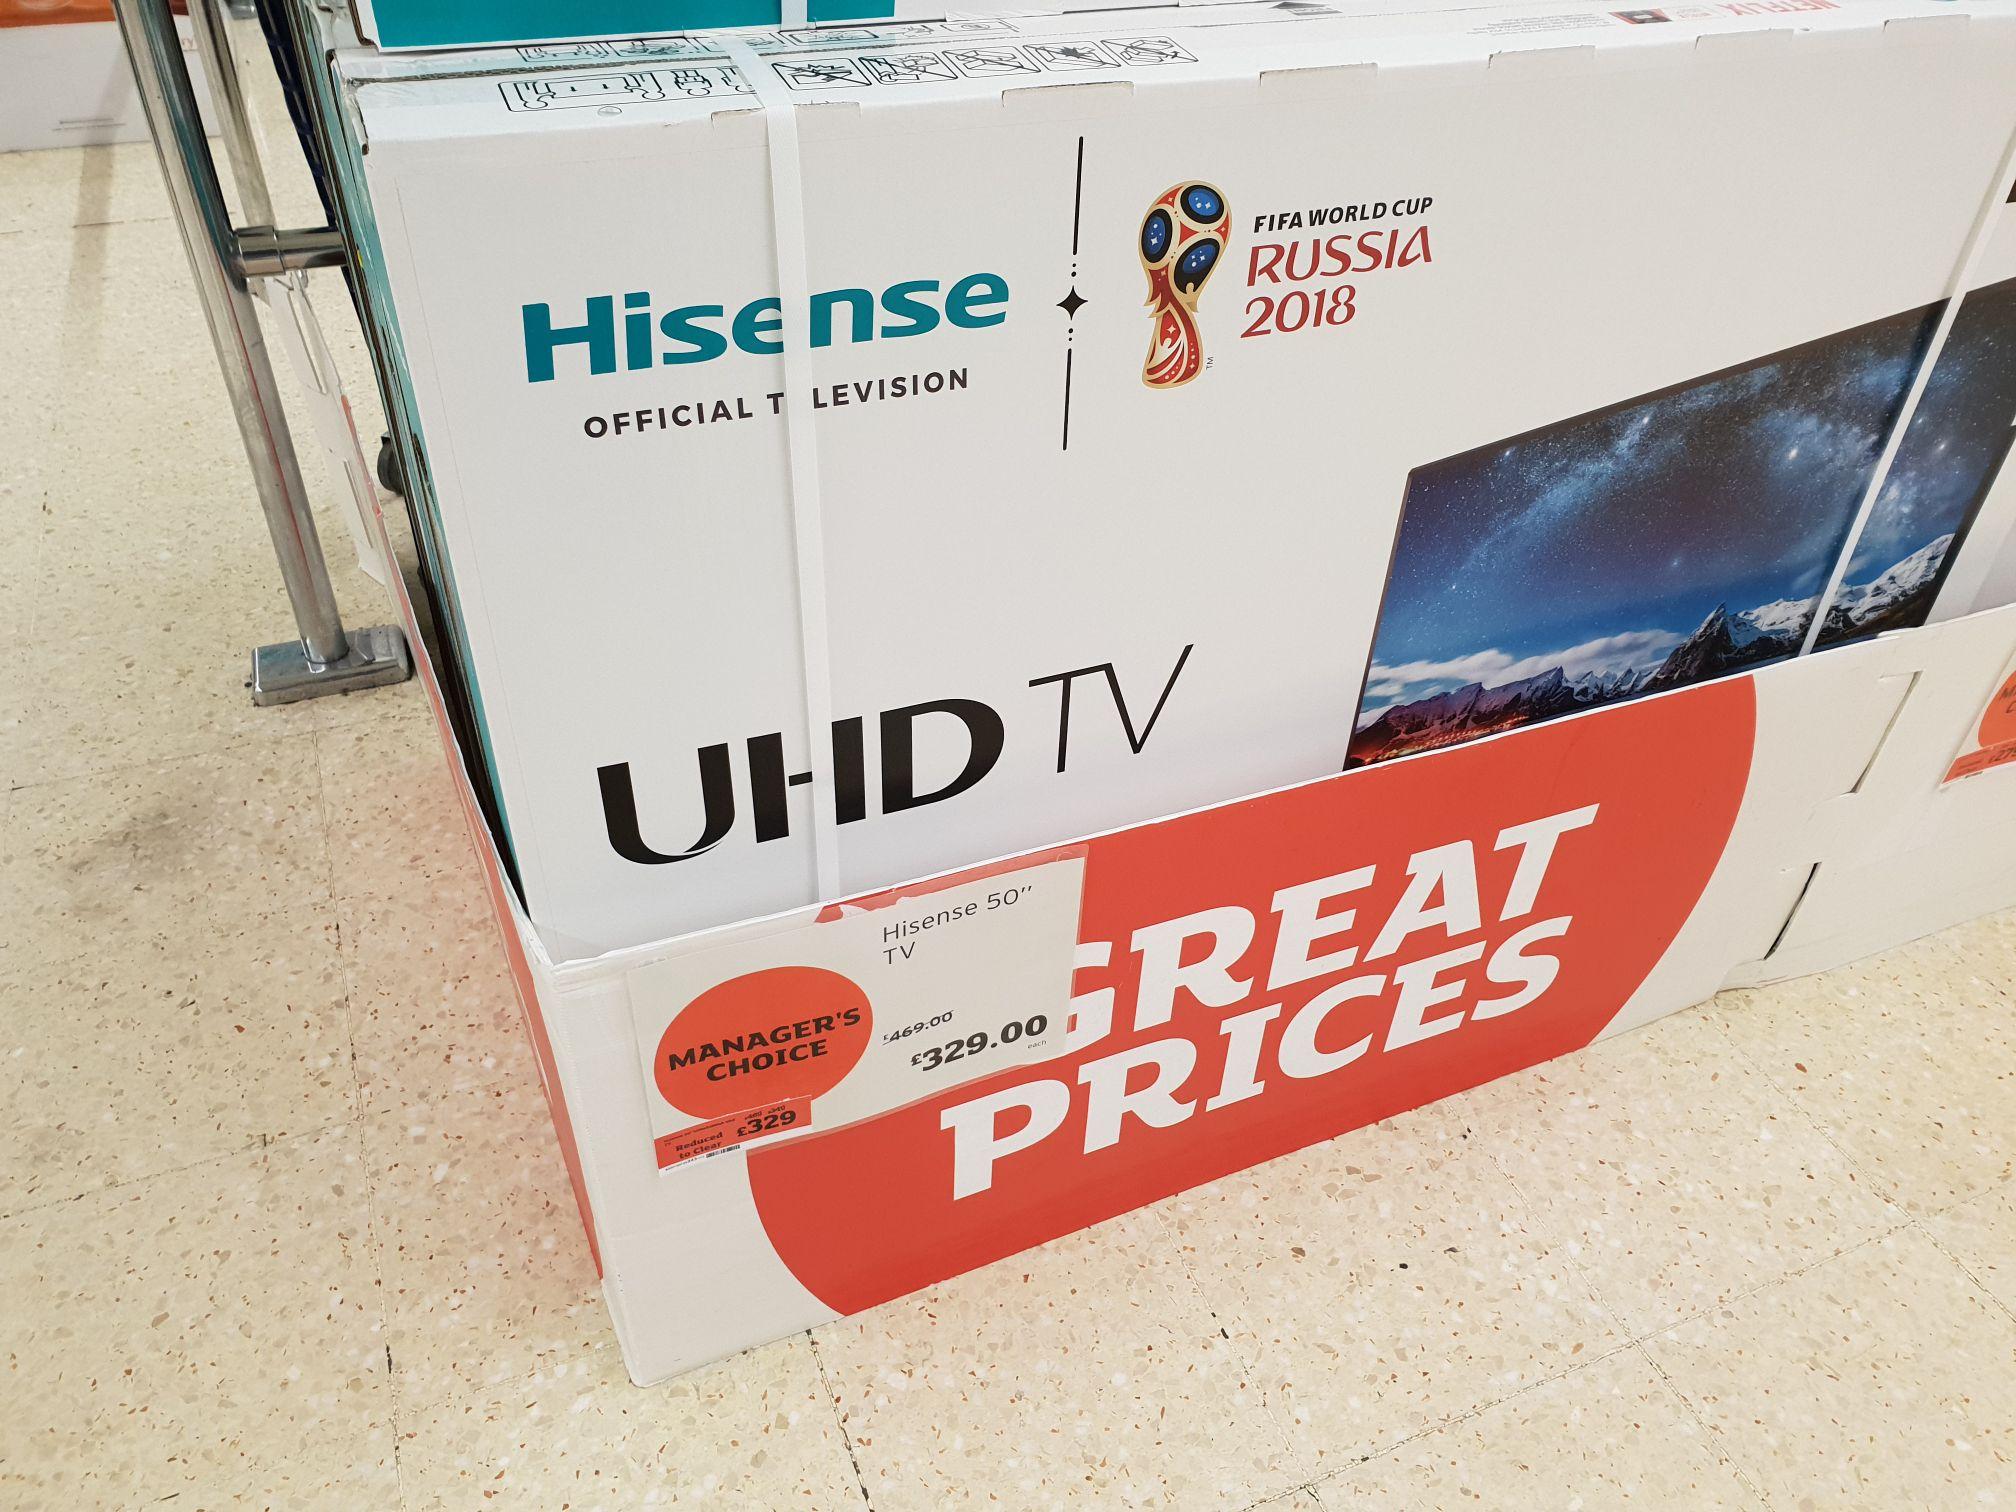 Hisense 50inch UHD TV - £329 instore @ Sainsburys (Whitechapel, London)